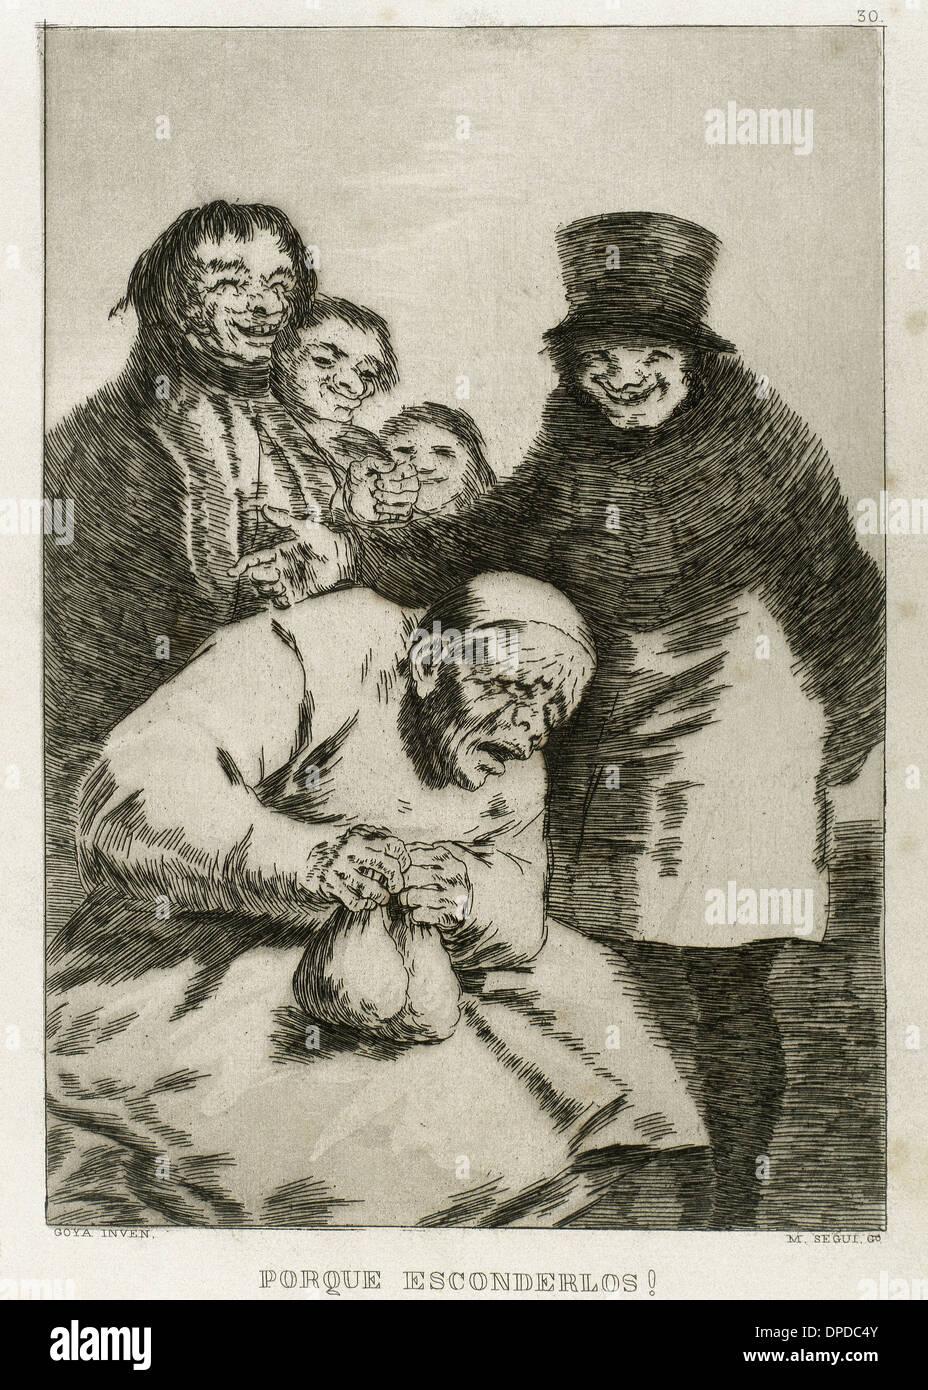 Goya (1746-1828). Spanish painter and printmaker. Los Caprichos. ¿Por que esconderlos? (Why hide them?) . Number 30. Aquatint. - Stock Image